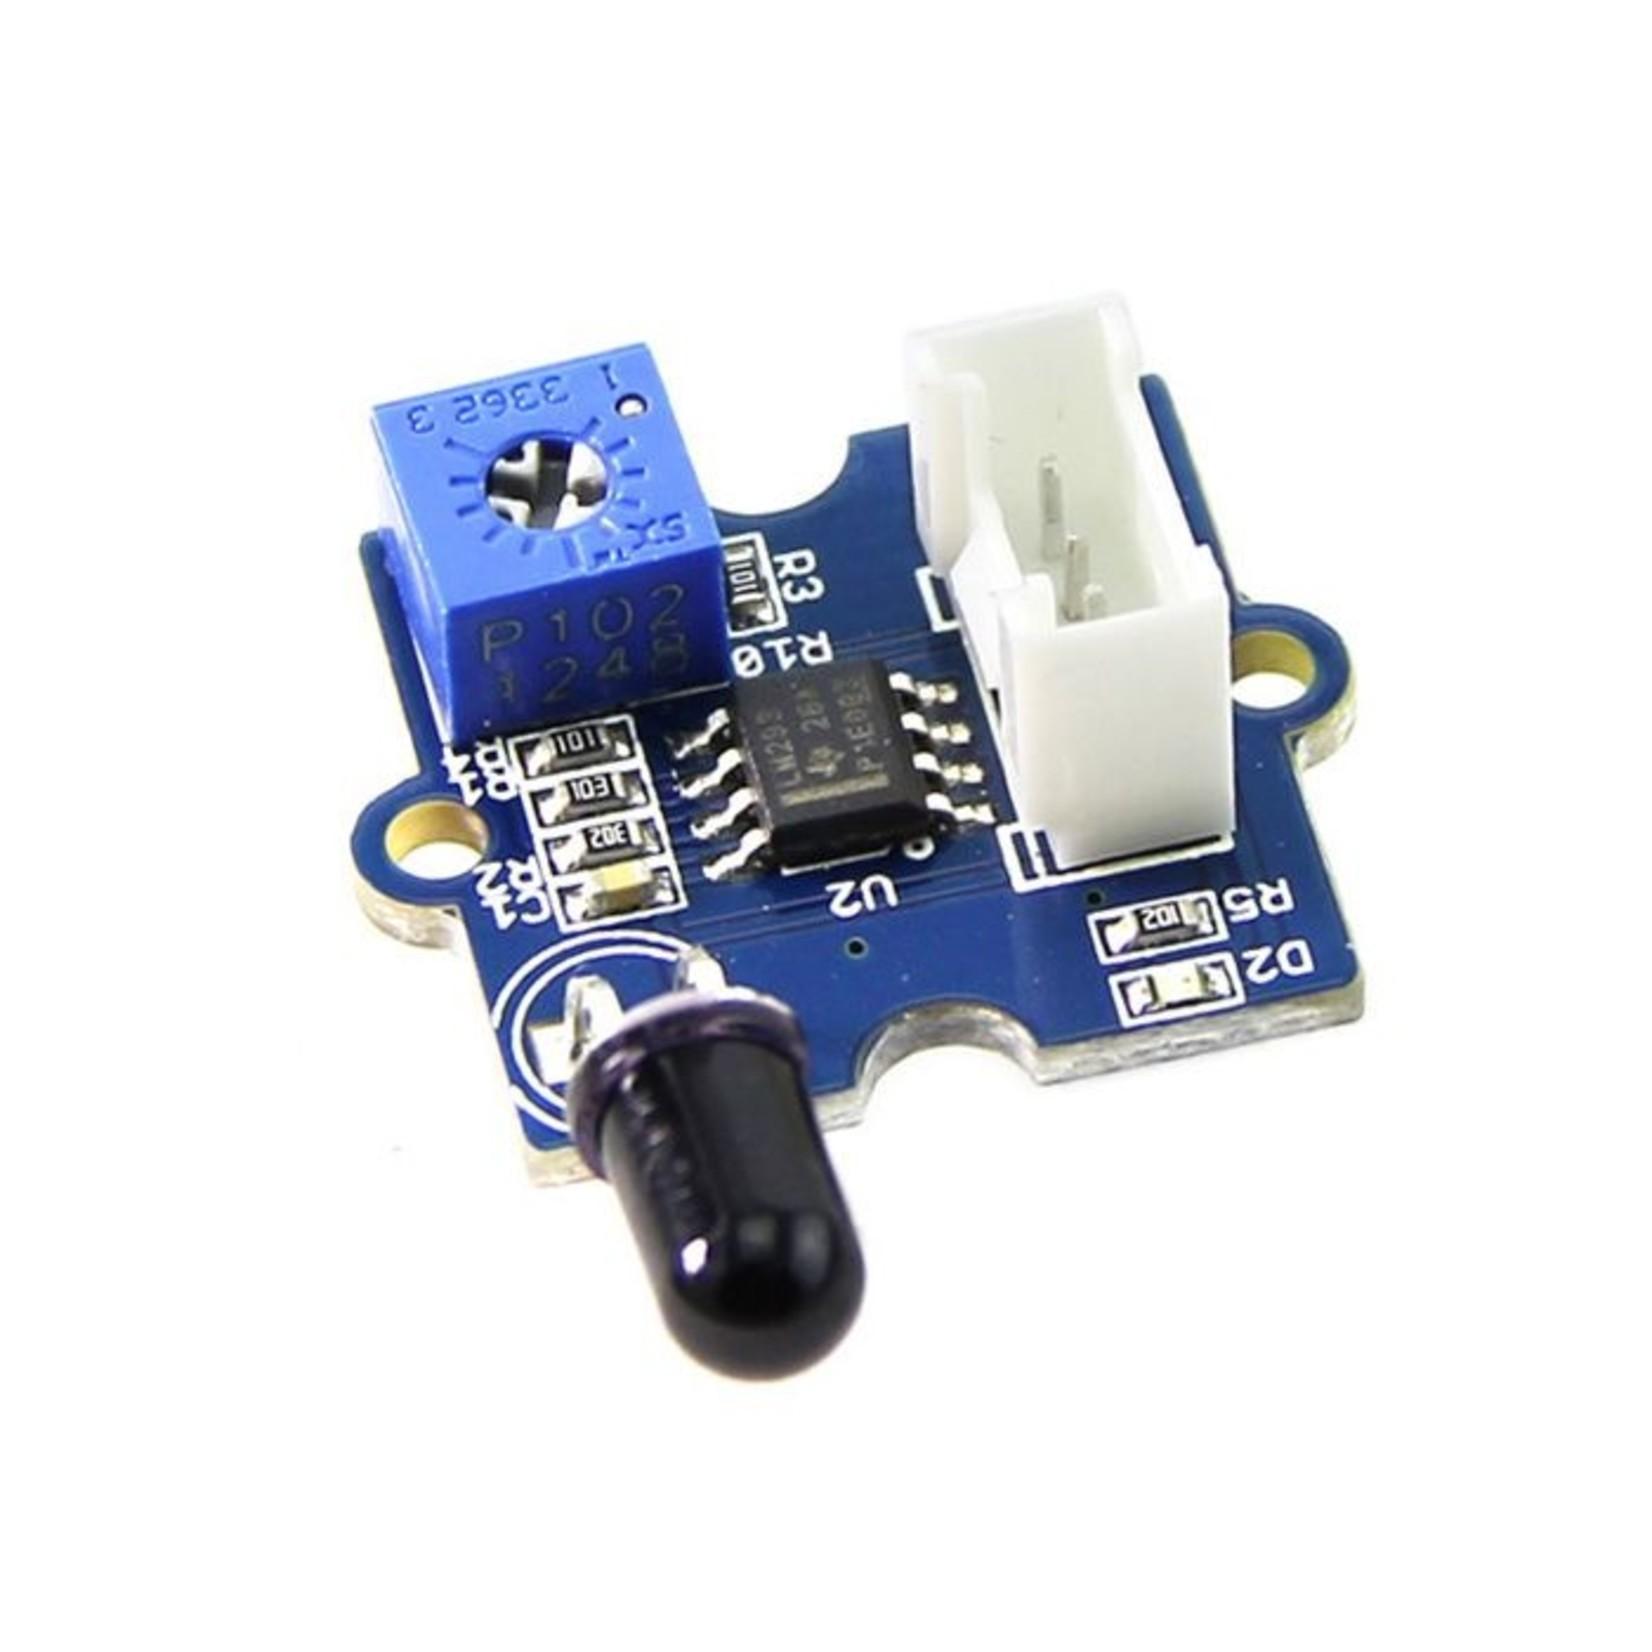 Seeed Grove - Flame Sensor